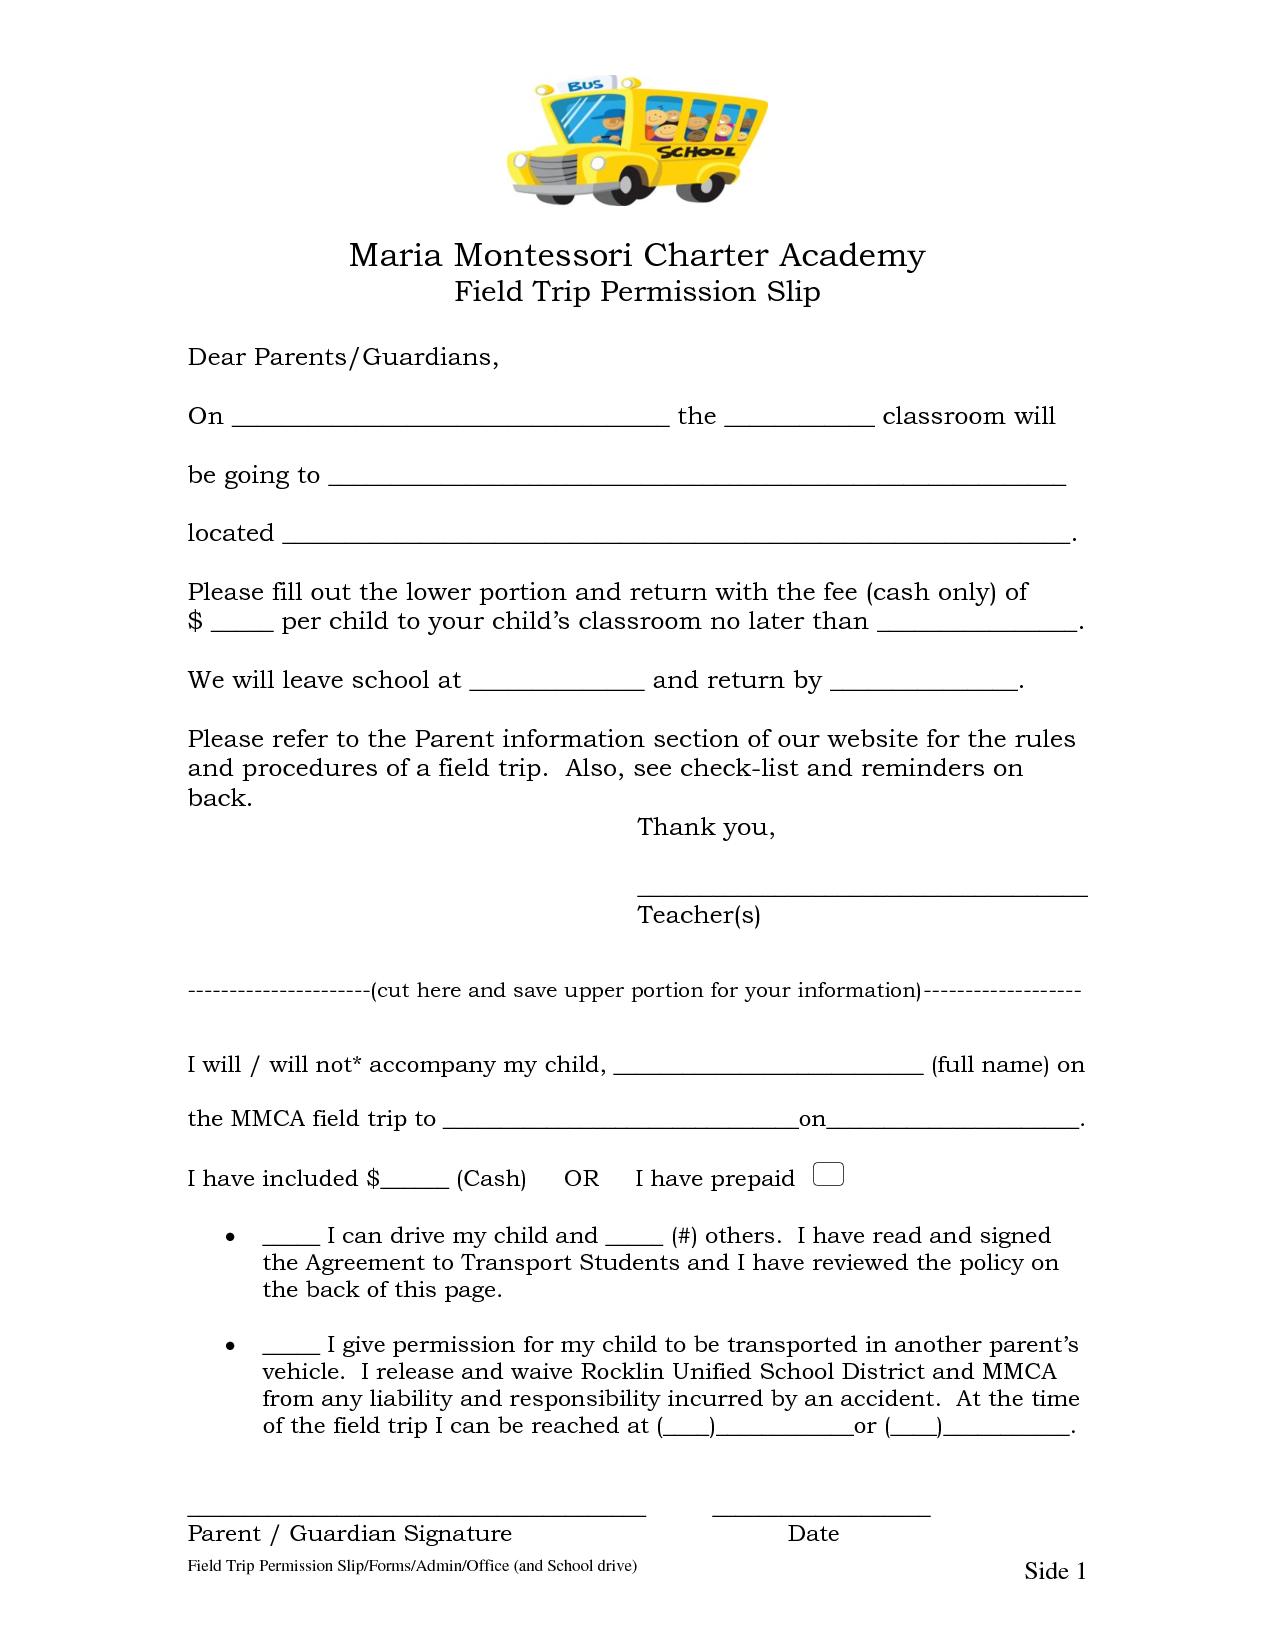 permission slip for field trip